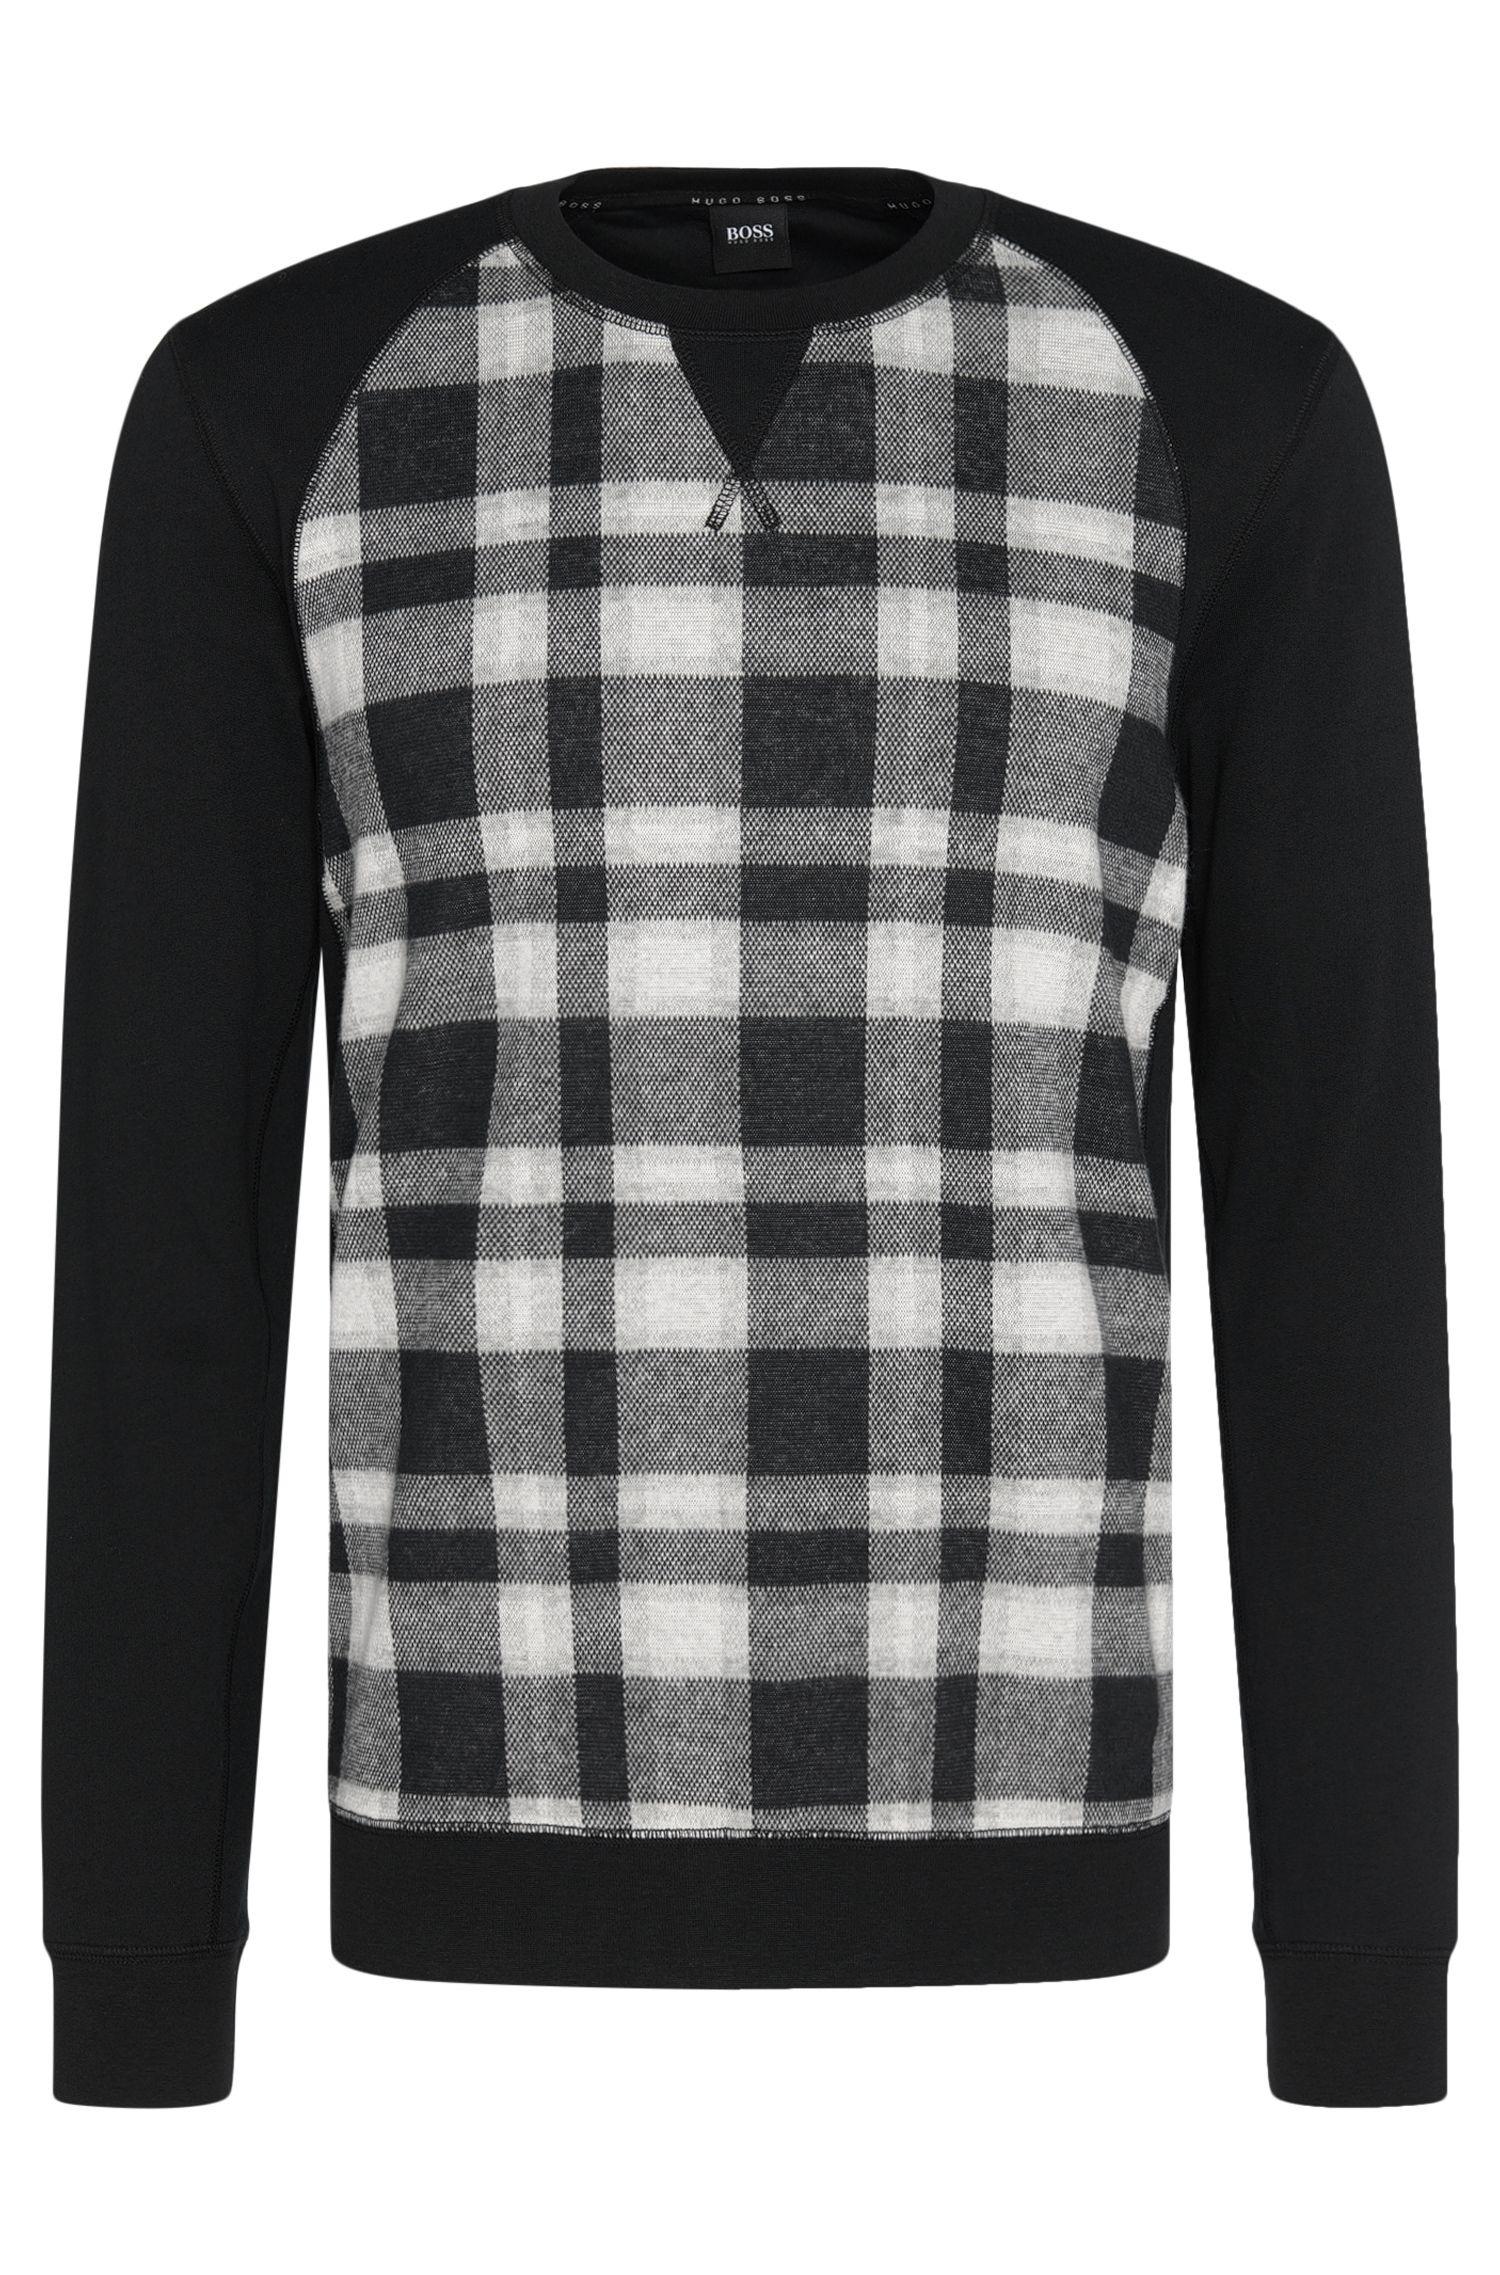 'Sweatshirt'   Cotton Plaid Sweatshirt